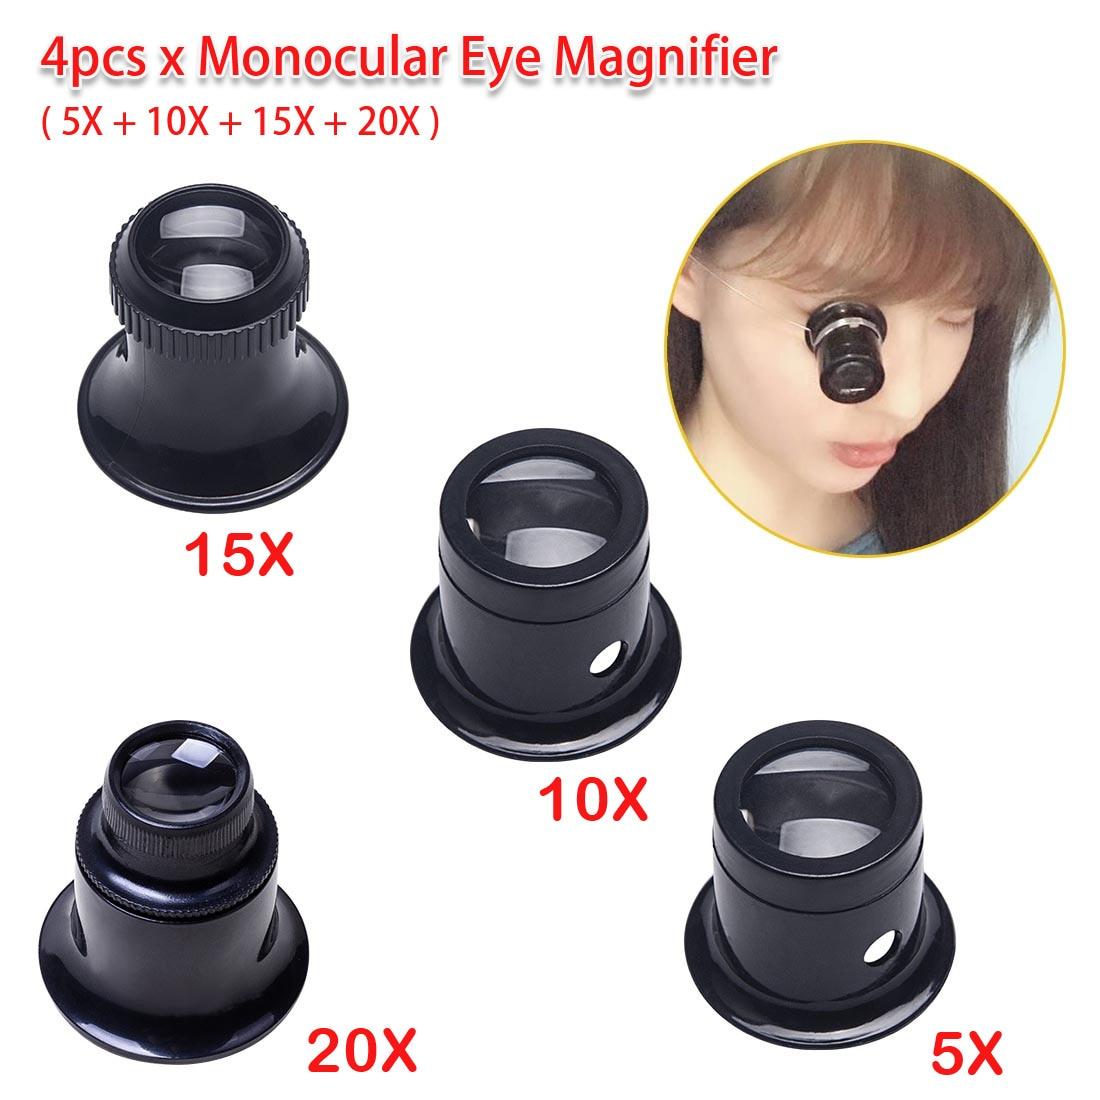 4pcs Portable 5X 10X 15X 20X Monocular Magnifying Glass Loupe Lens For Jeweler Watch Magnifier Tool Eye Magnifier Len Repair Kit